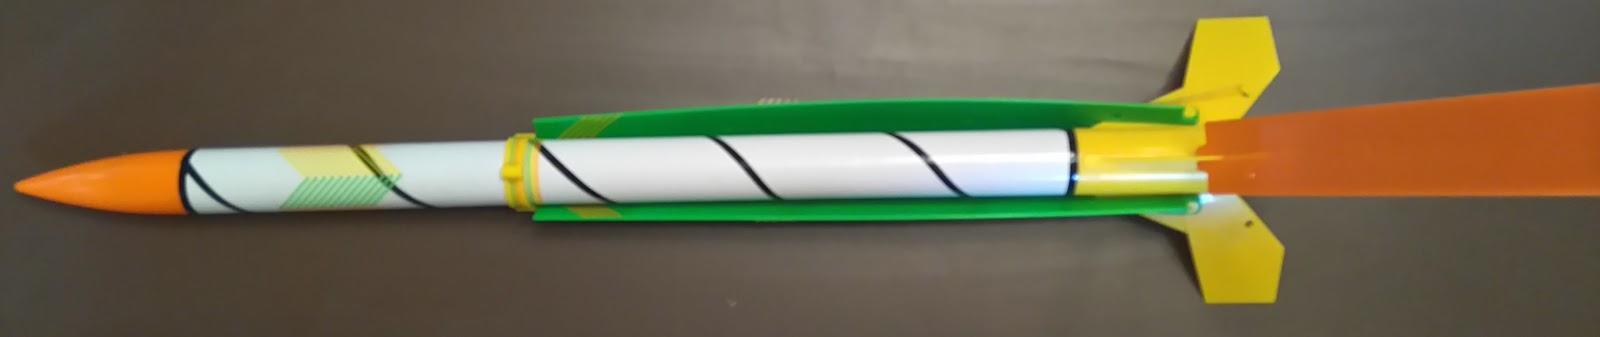 estes flip flyer 2416 and booster mod model rocket collection